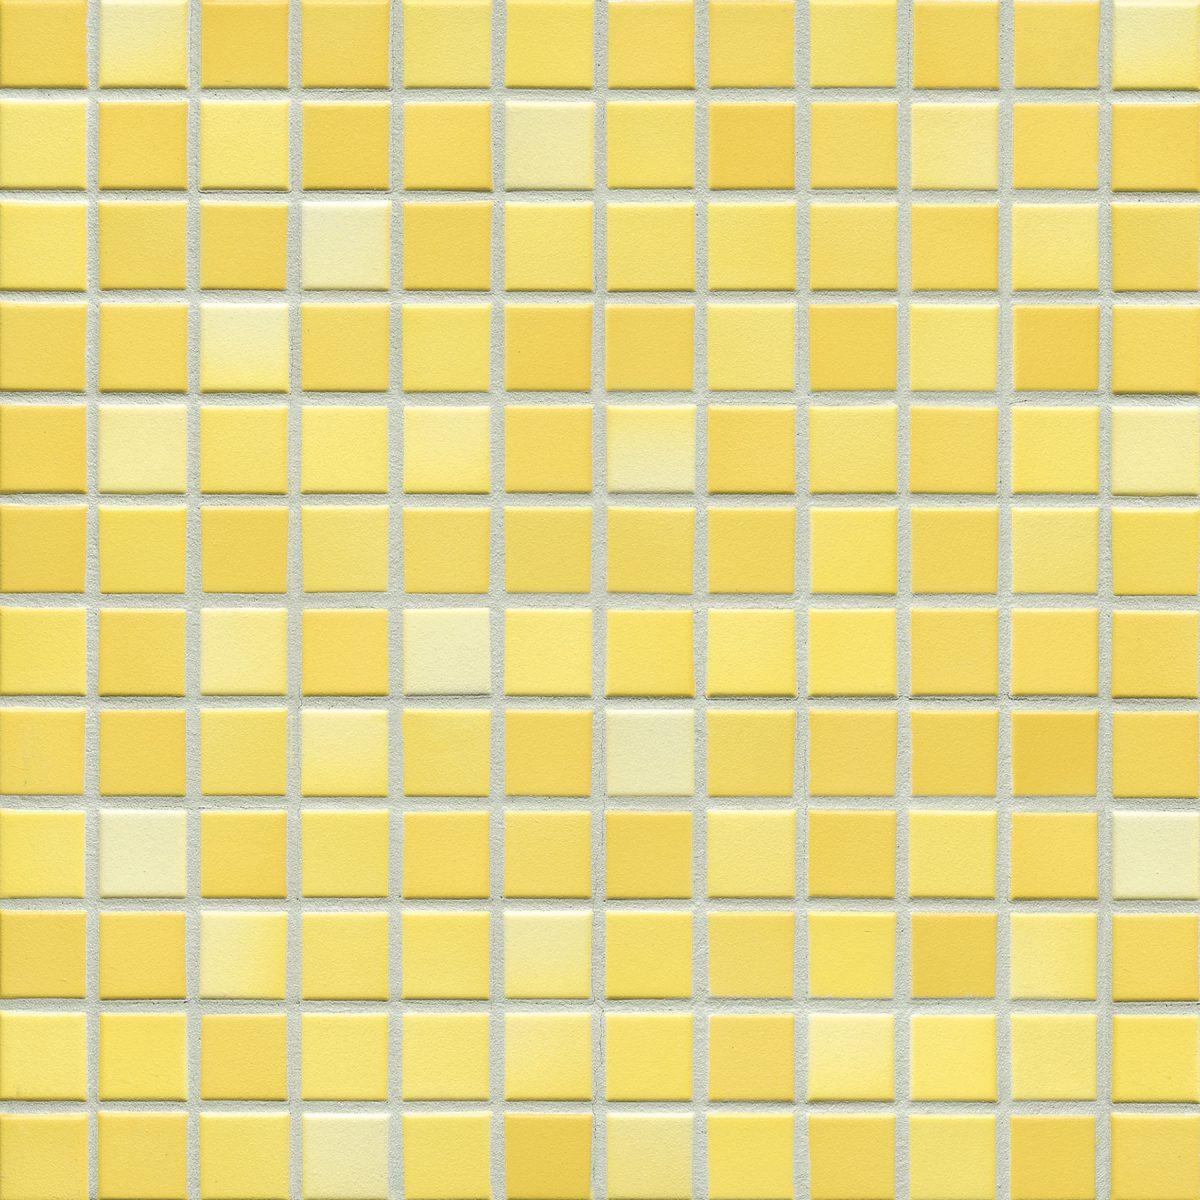 Мозаика серия Fresh 2,4 X 2,4 см Sunshine Yellow Mix Secura (противоскользящая R10/B)